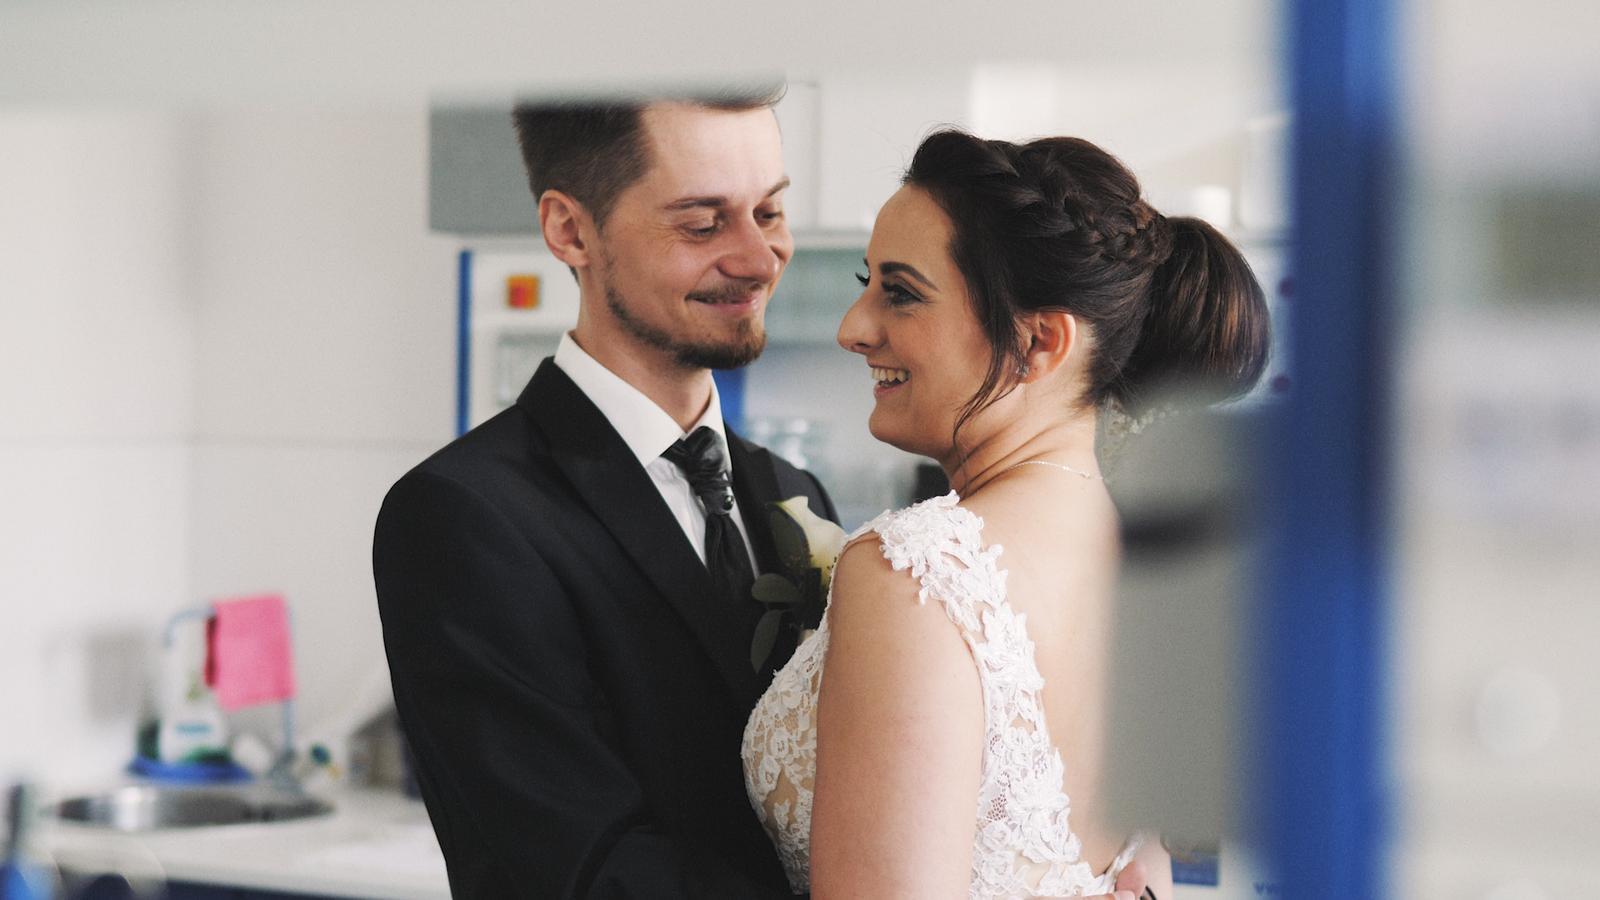 Svadba Matúša a Vierky - Obrázok č. 1